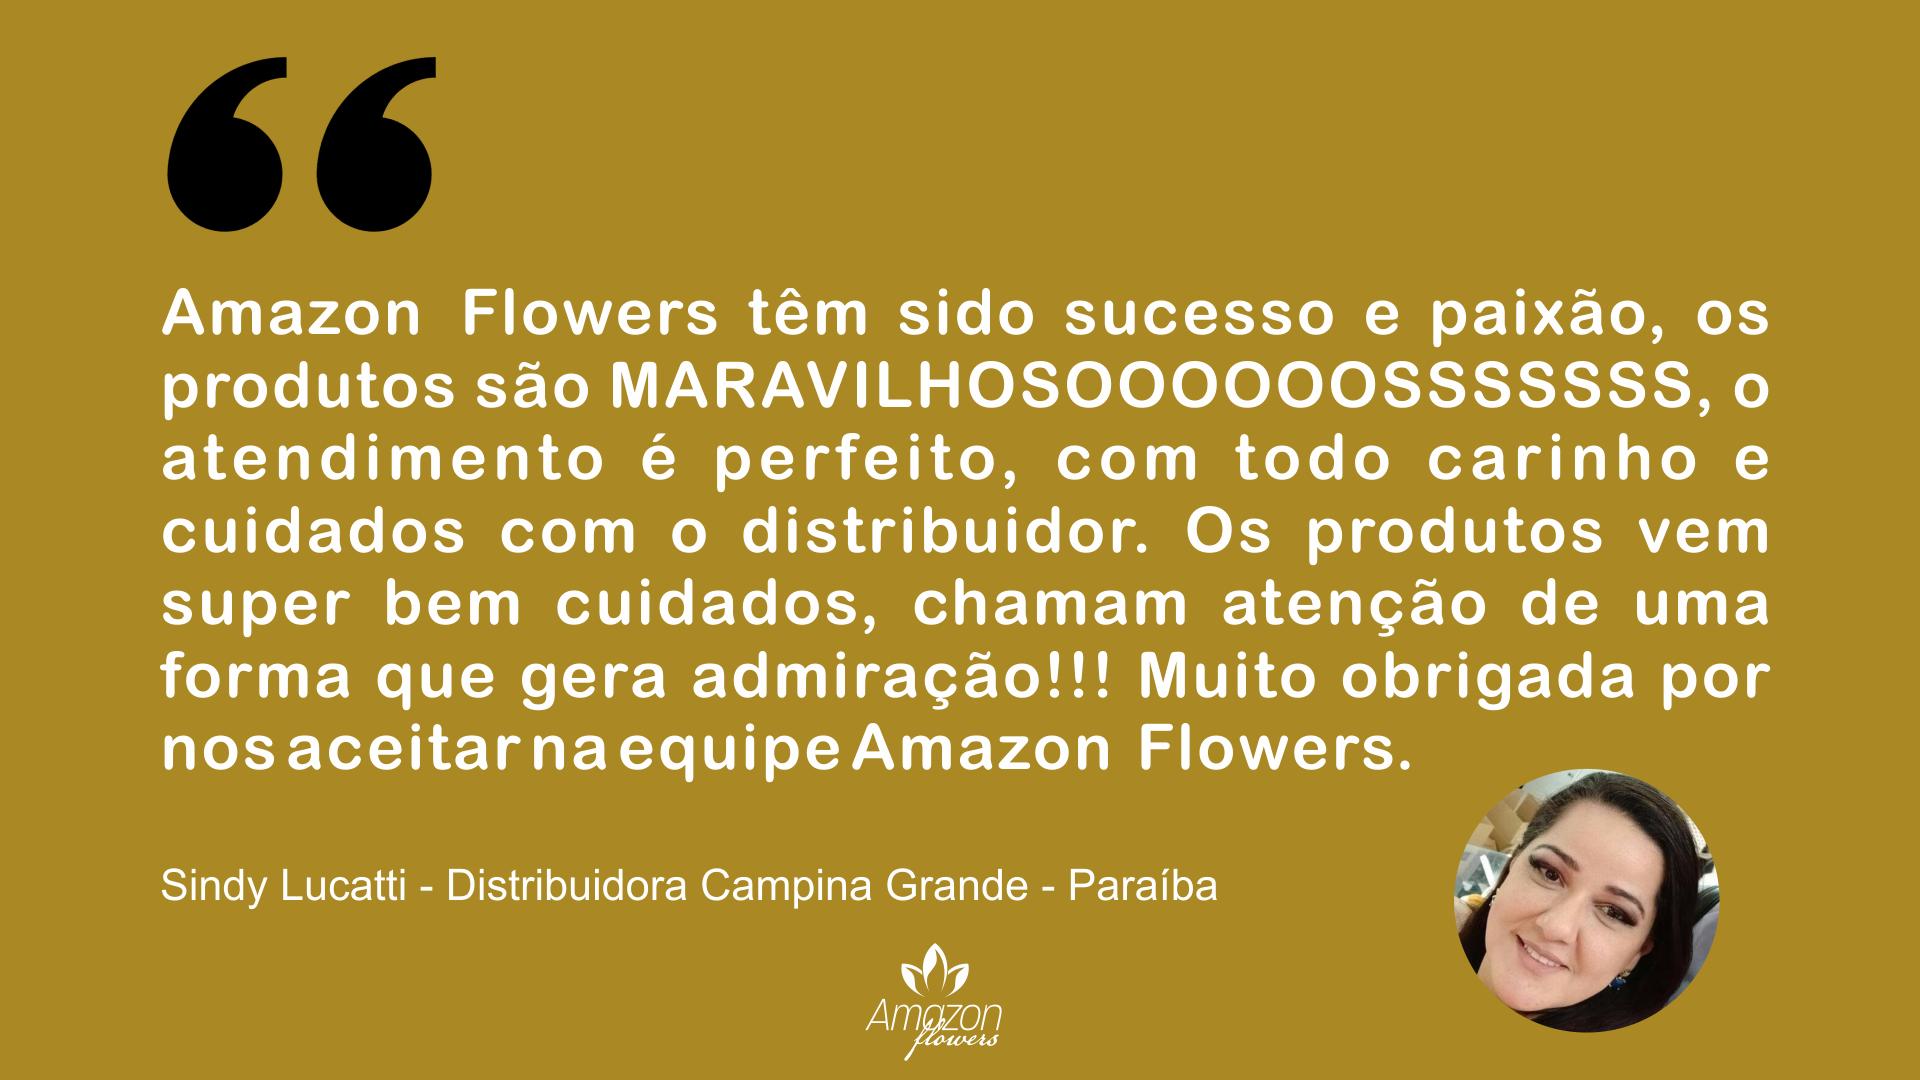 Sindy Lucatti - Distribuidora Campina Grande - Paraíba